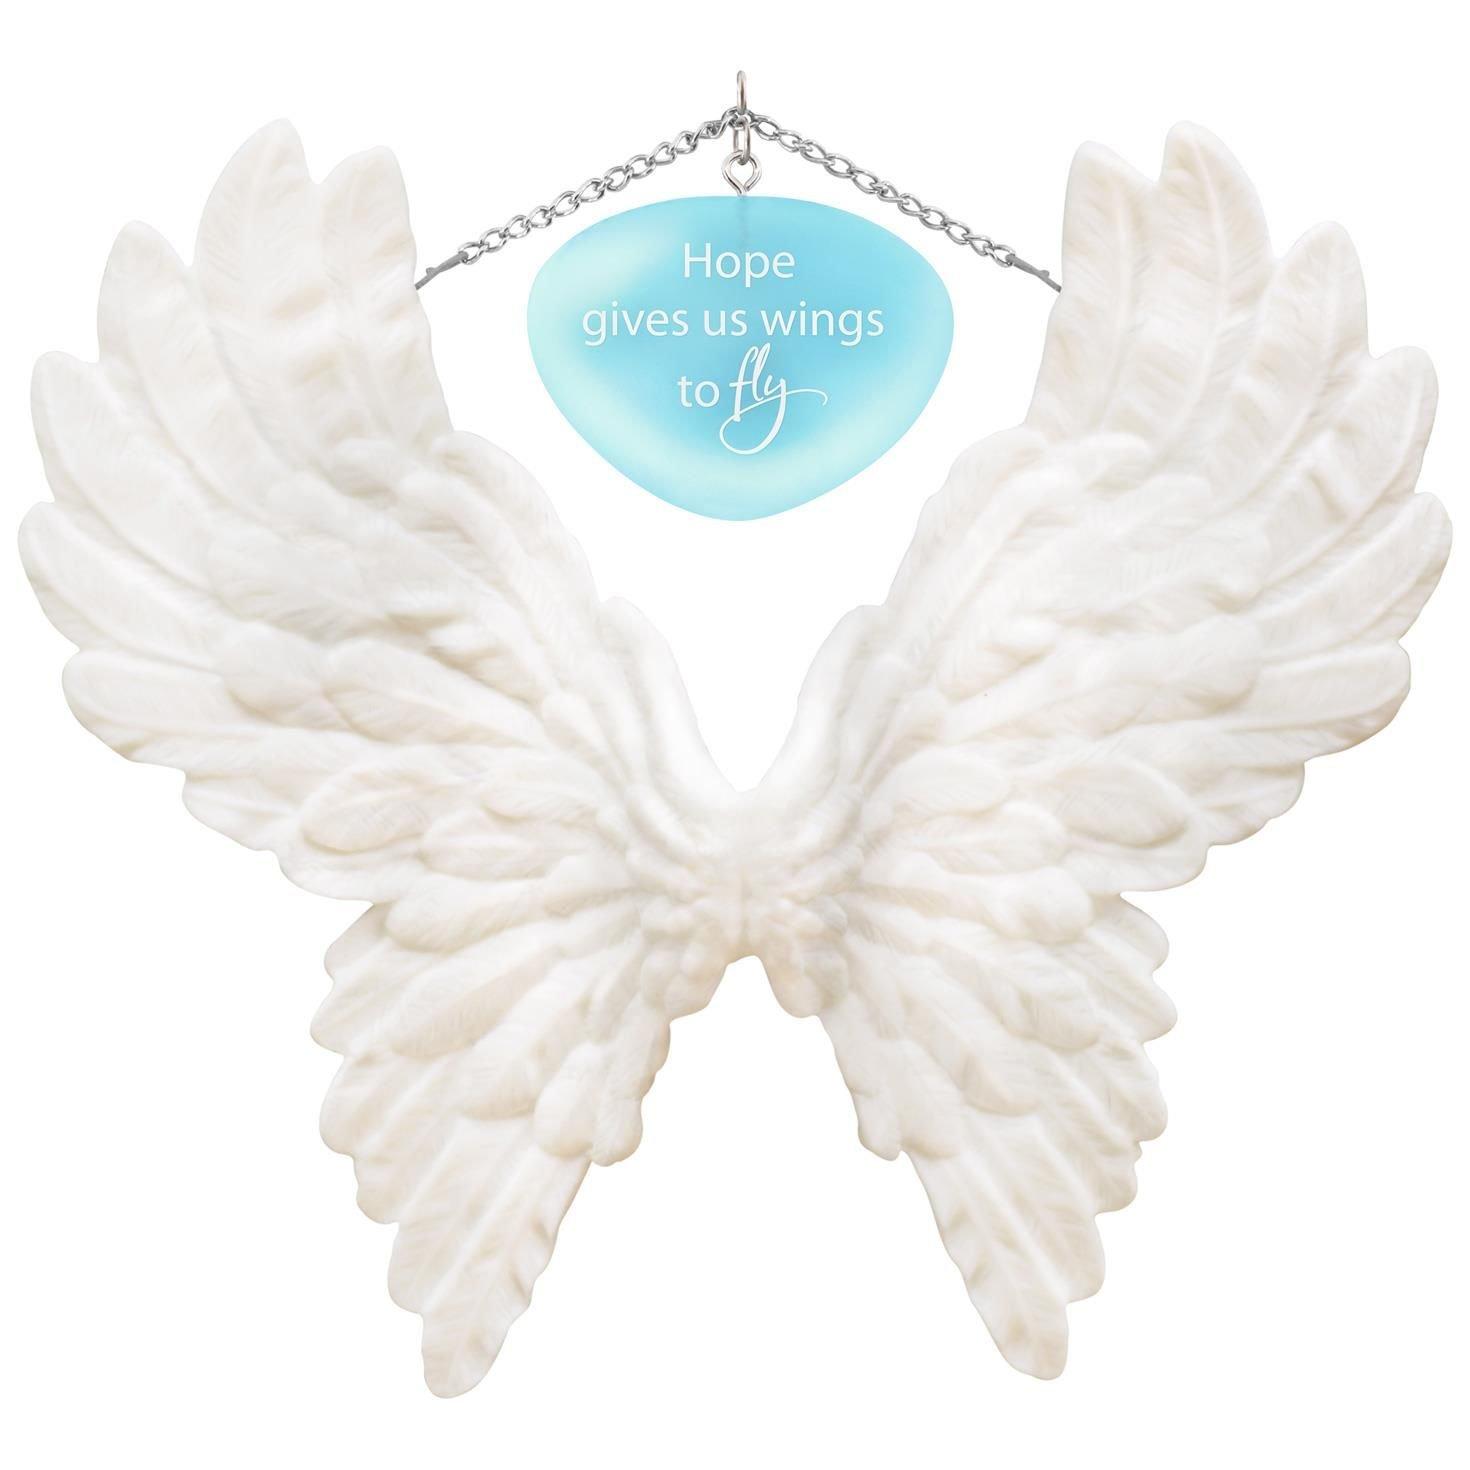 Hallmark Keepsake 2017 Wings to Fly Encouragement Porcelain Dated Christmas Ornament